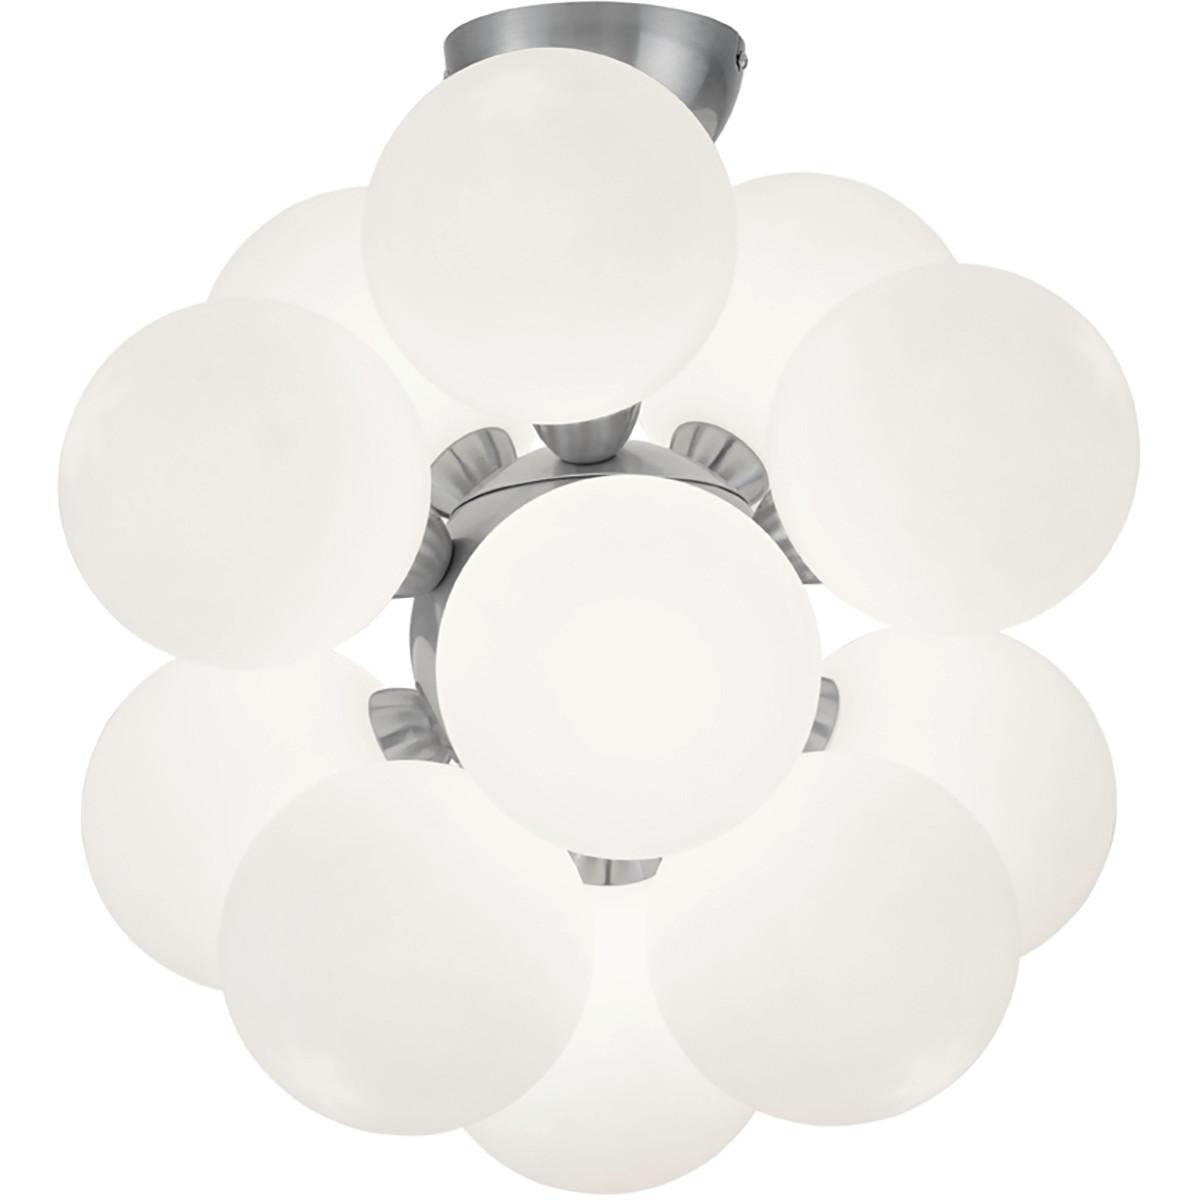 LED Plafondlamp - Plafondverlichting - Trion Alionisa - G9 Fitting - 12-lichts - Rond - Mat Nikkel -